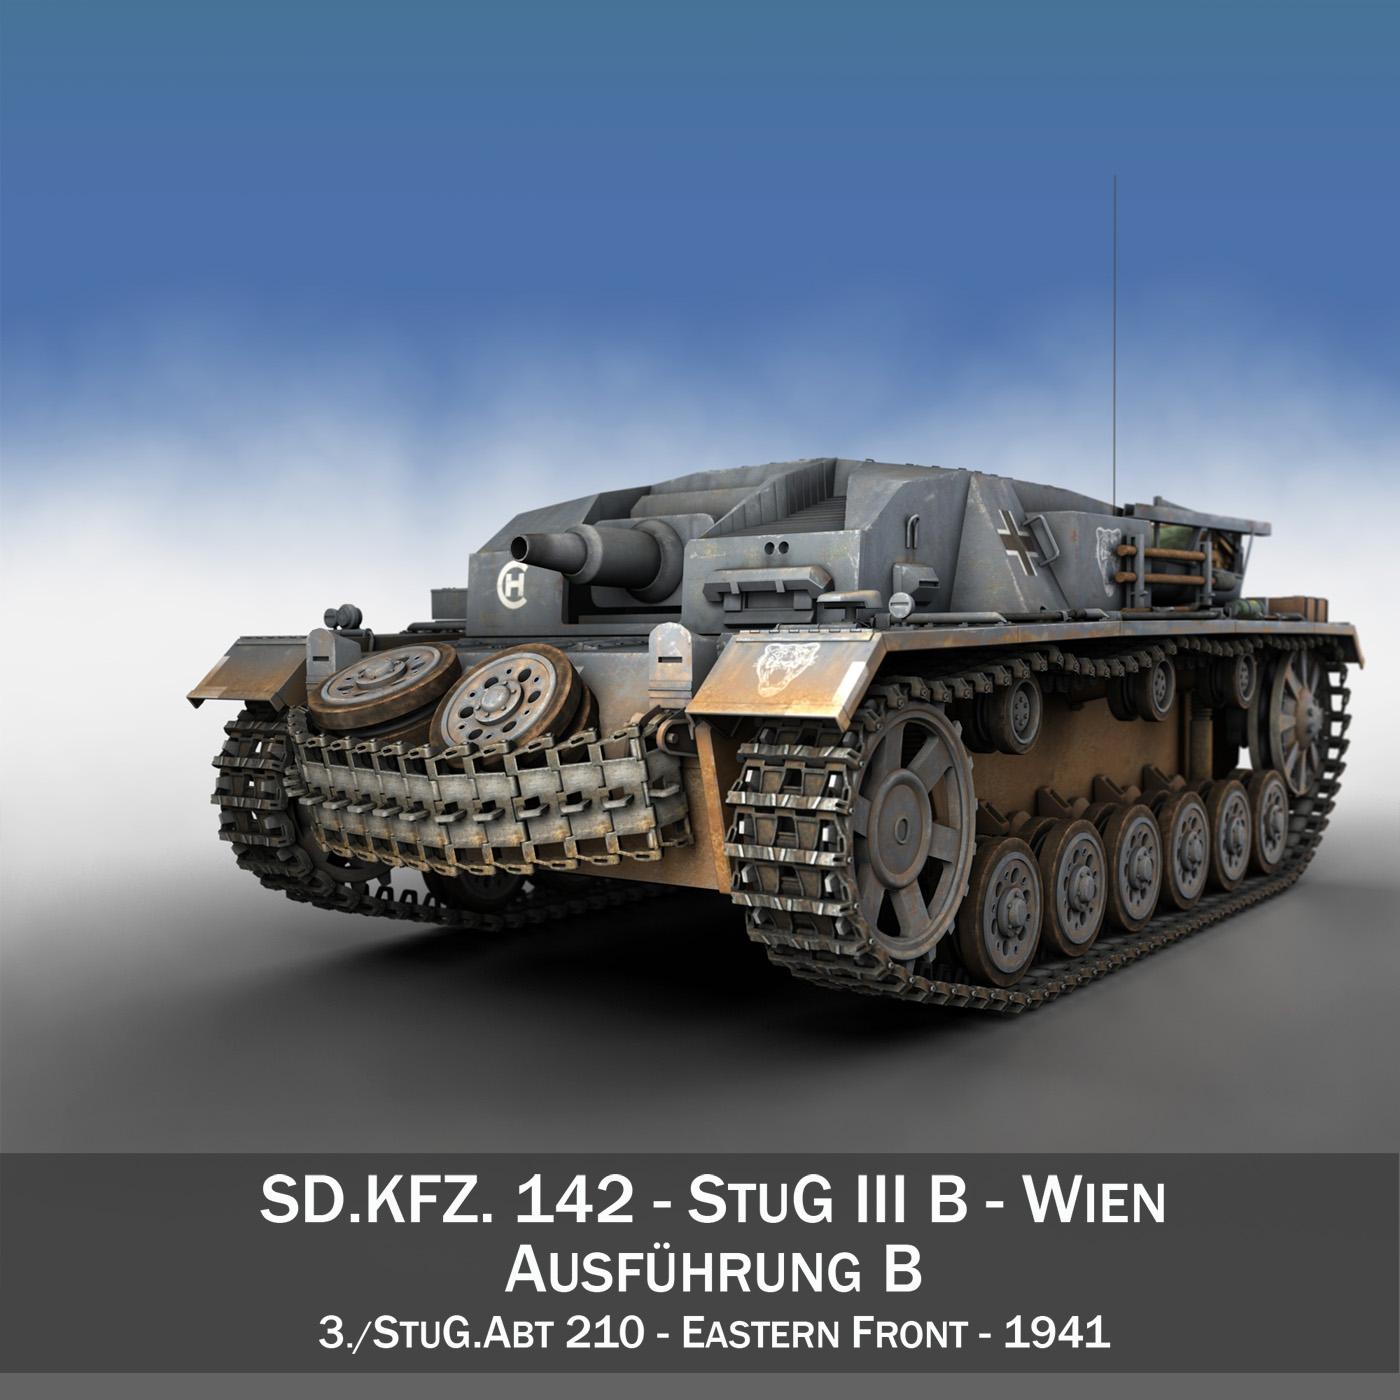 stug iii - ausf.b - wien 3d modelis 3ds fbx lws lws obj c4d 265838